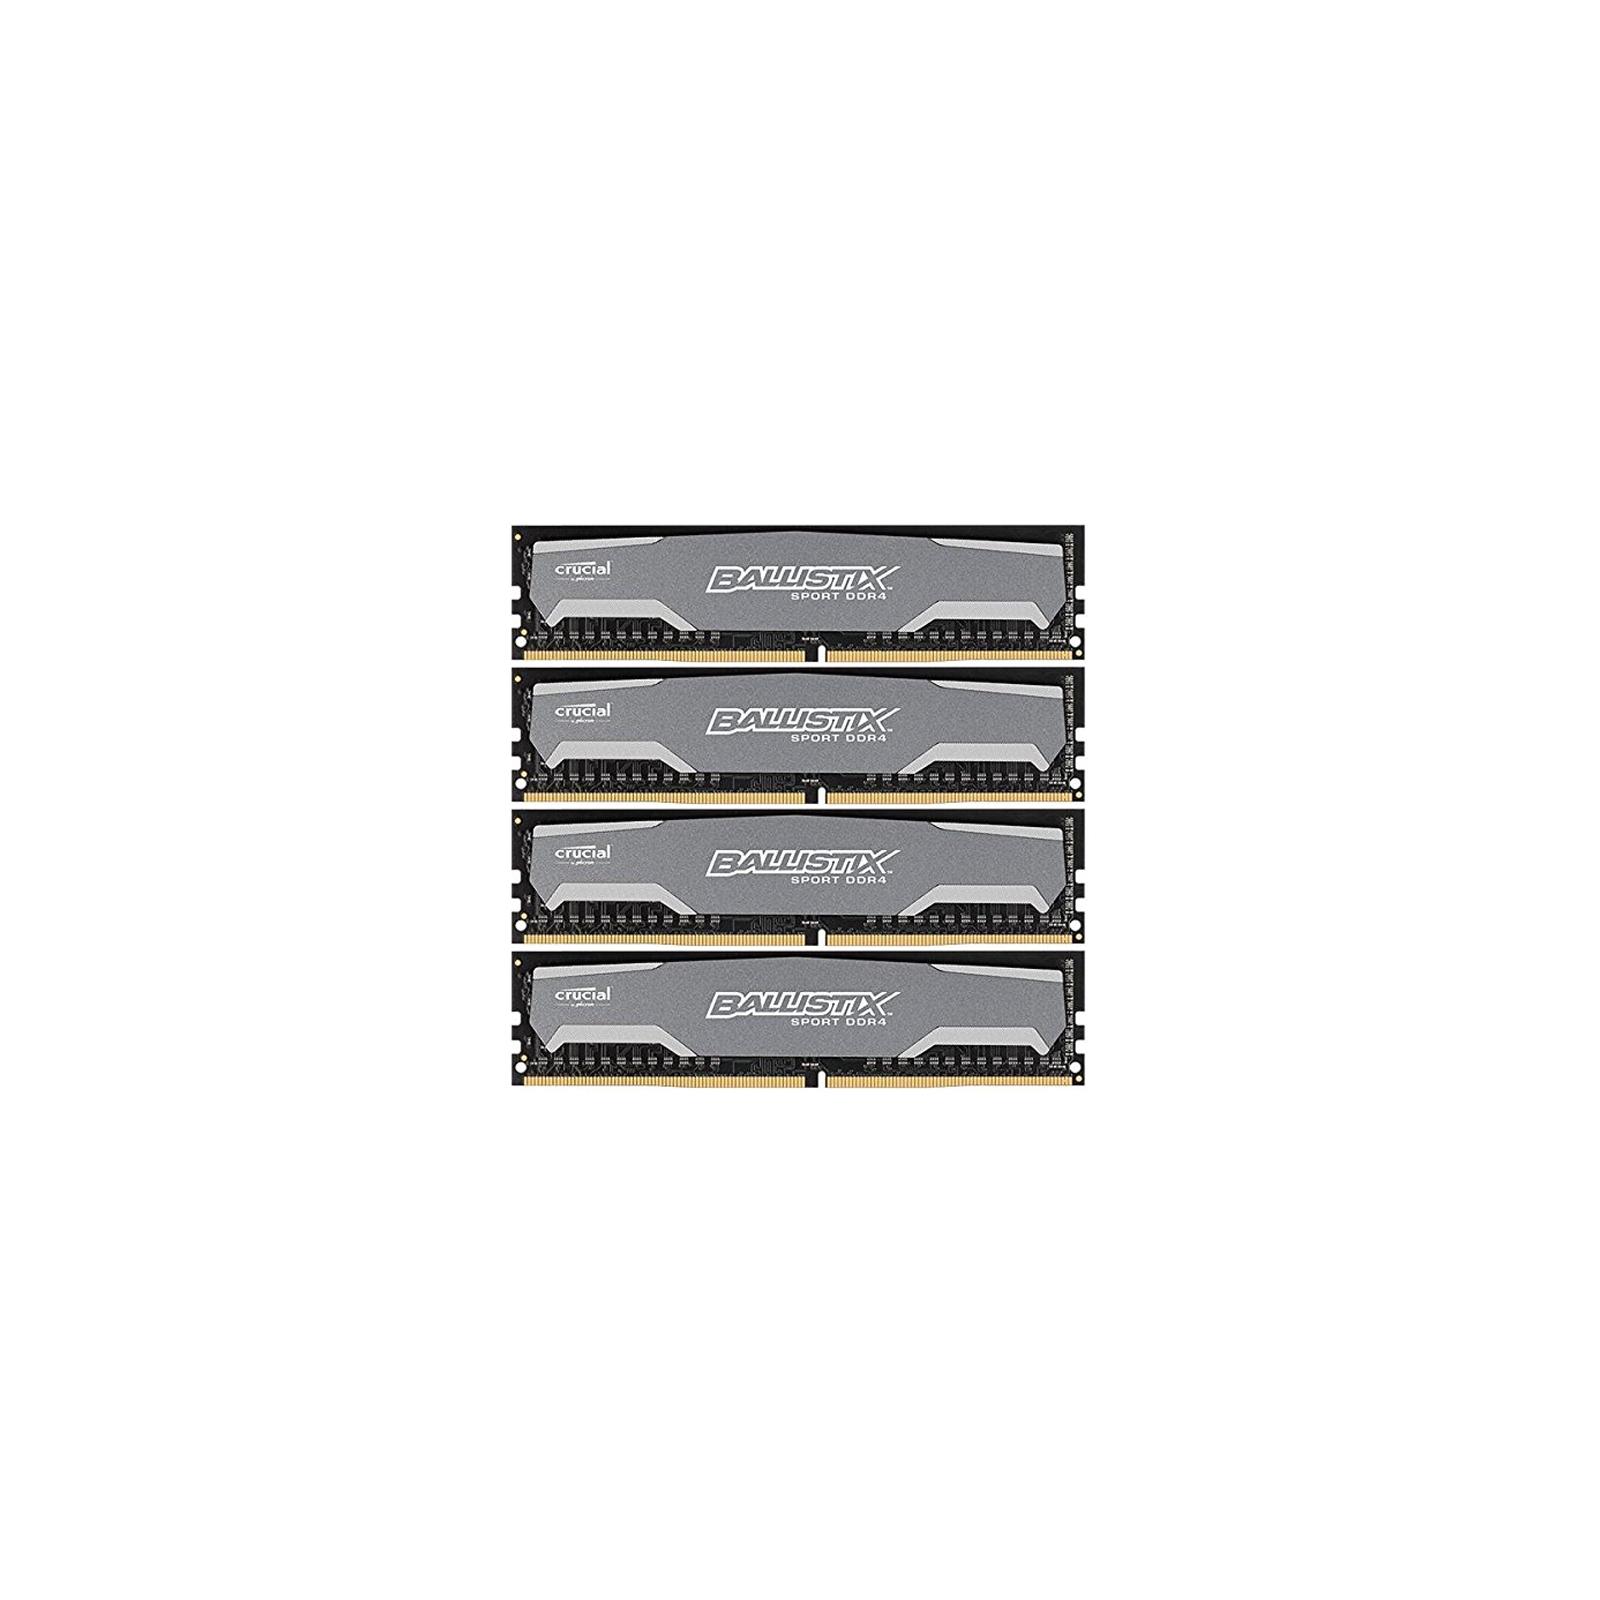 Модуль памяти для компьютера DDR4 32GB (4x8GB) 2400 MHz Ballistix Sport MICRON (BLS4C8G4D240FSA)